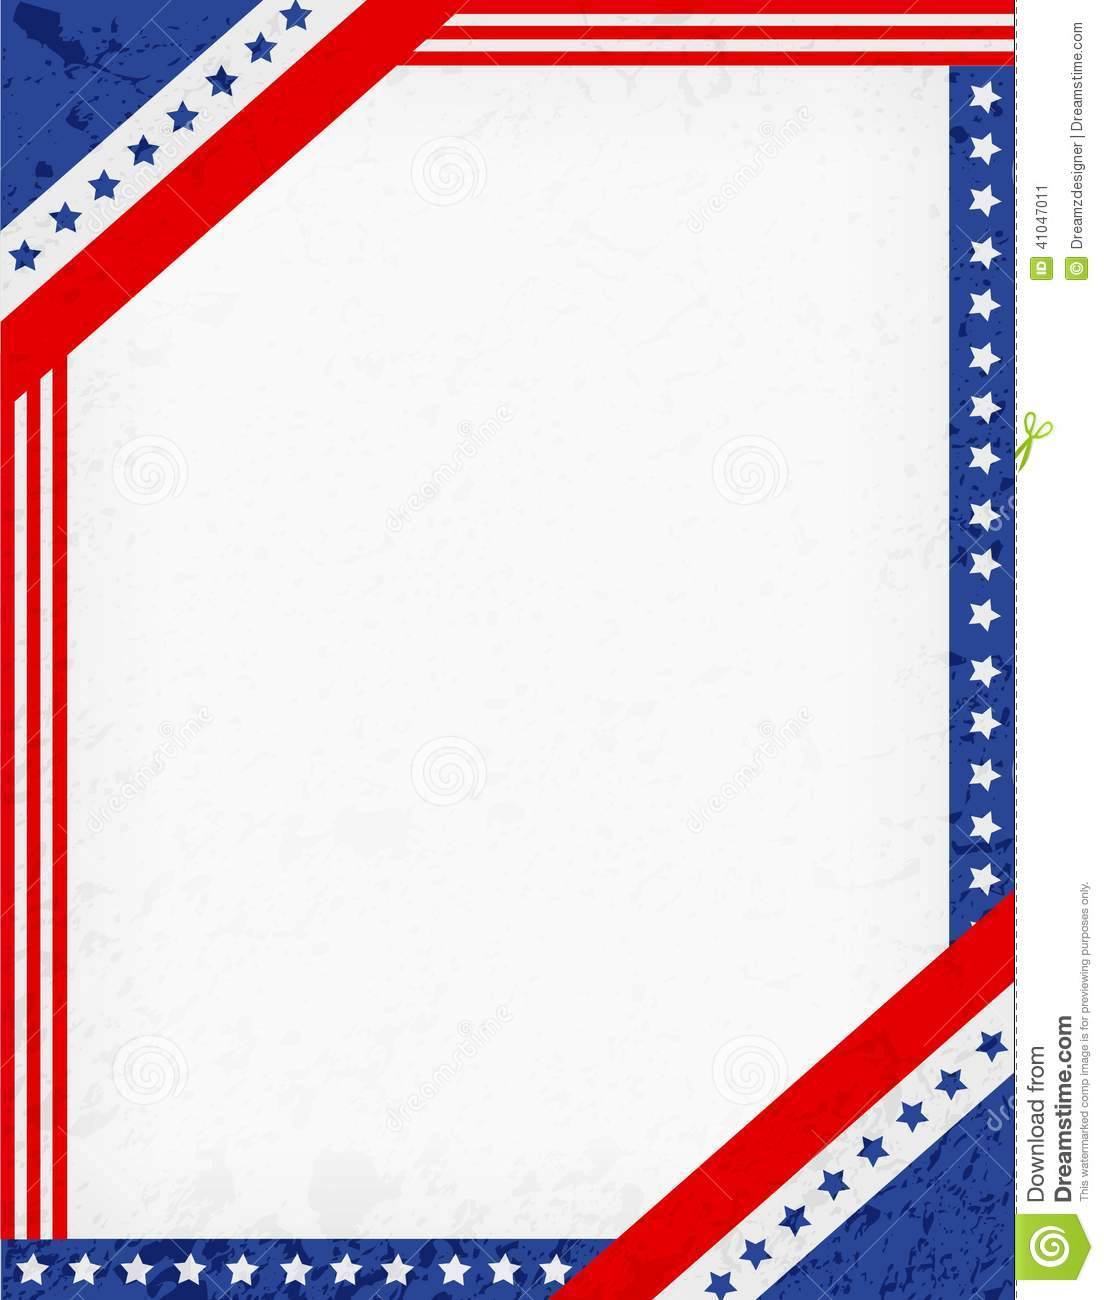 Patriotic Star Border Clip Art Patriotic Border Red Blue American Flag